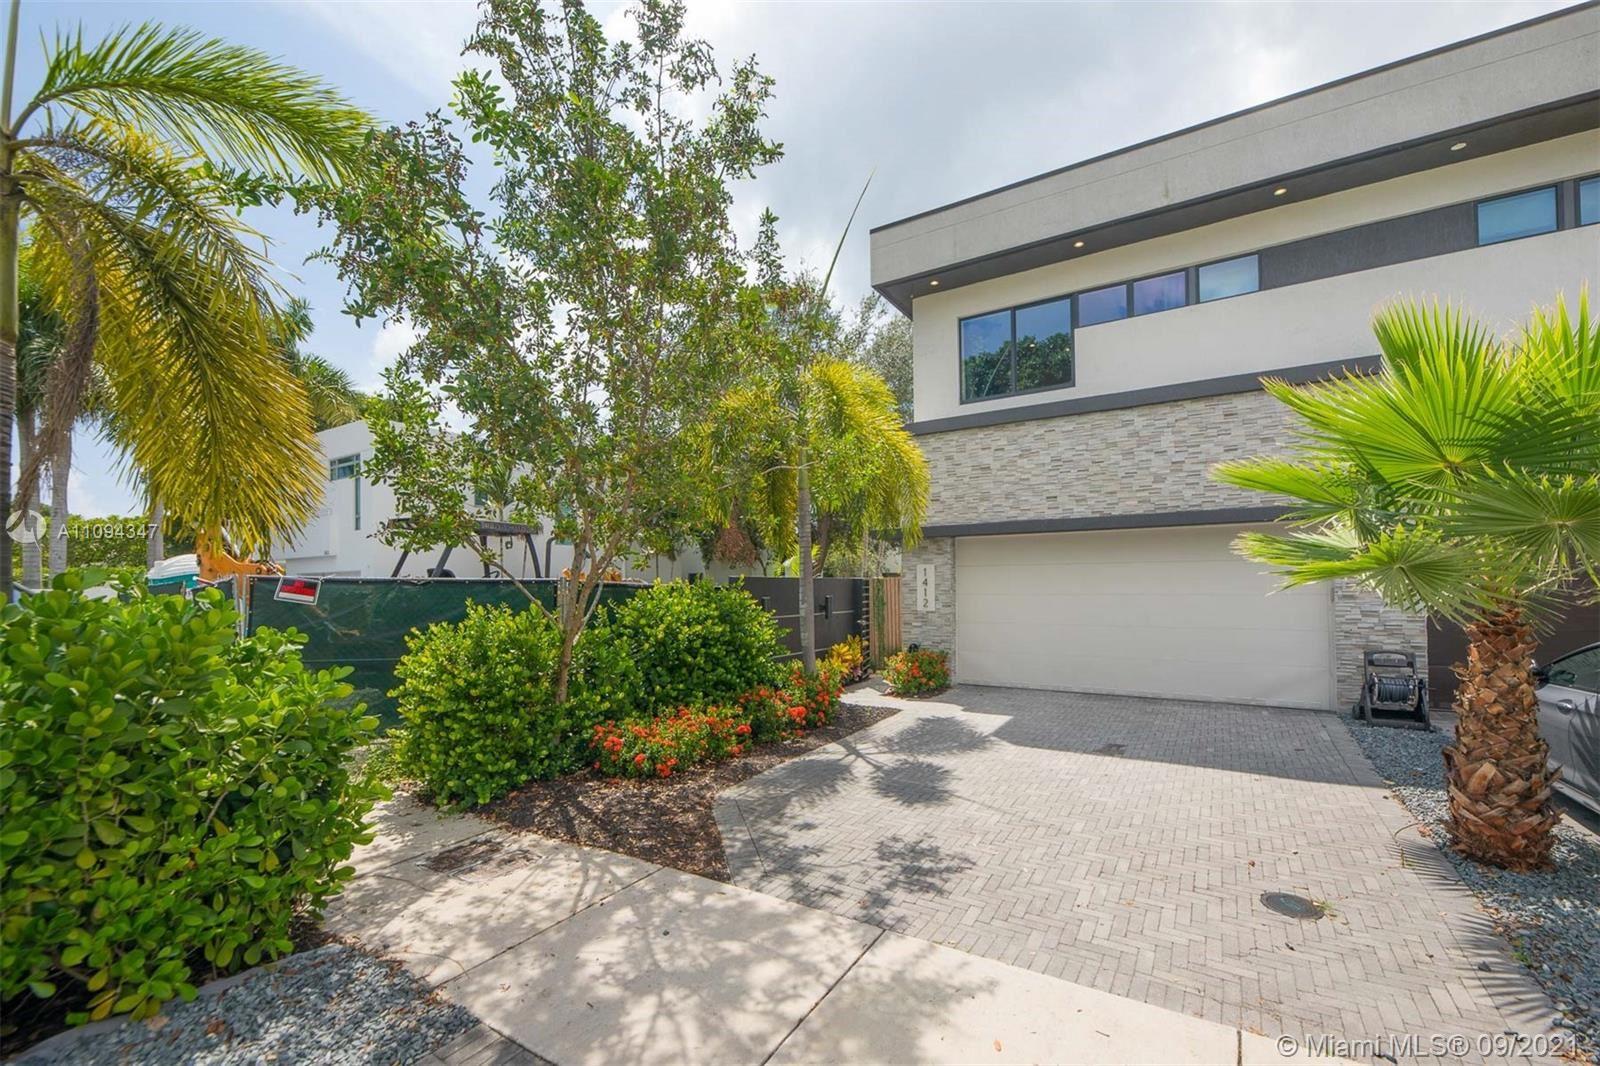 Photo of 1412 NE 6th St, Fort Lauderdale, FL 33304 (MLS # A11094347)